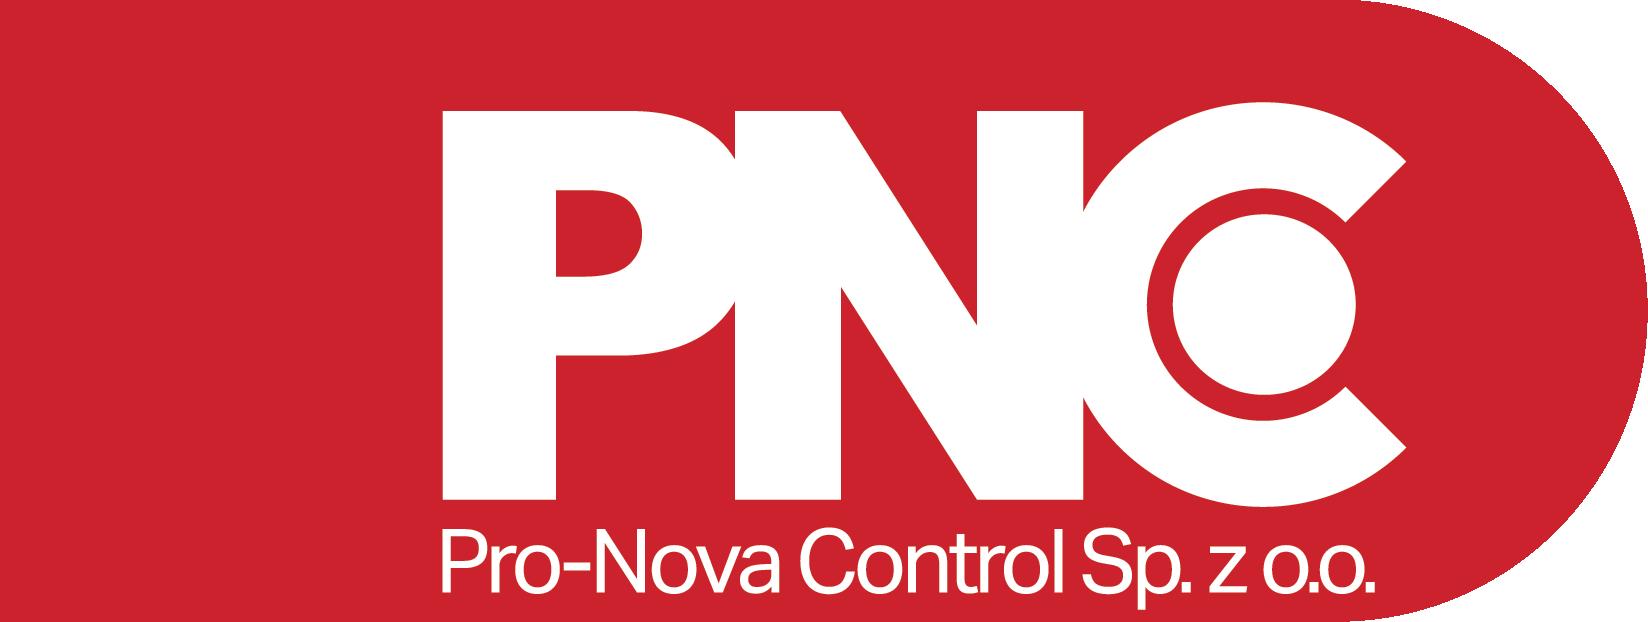 Pronova Control